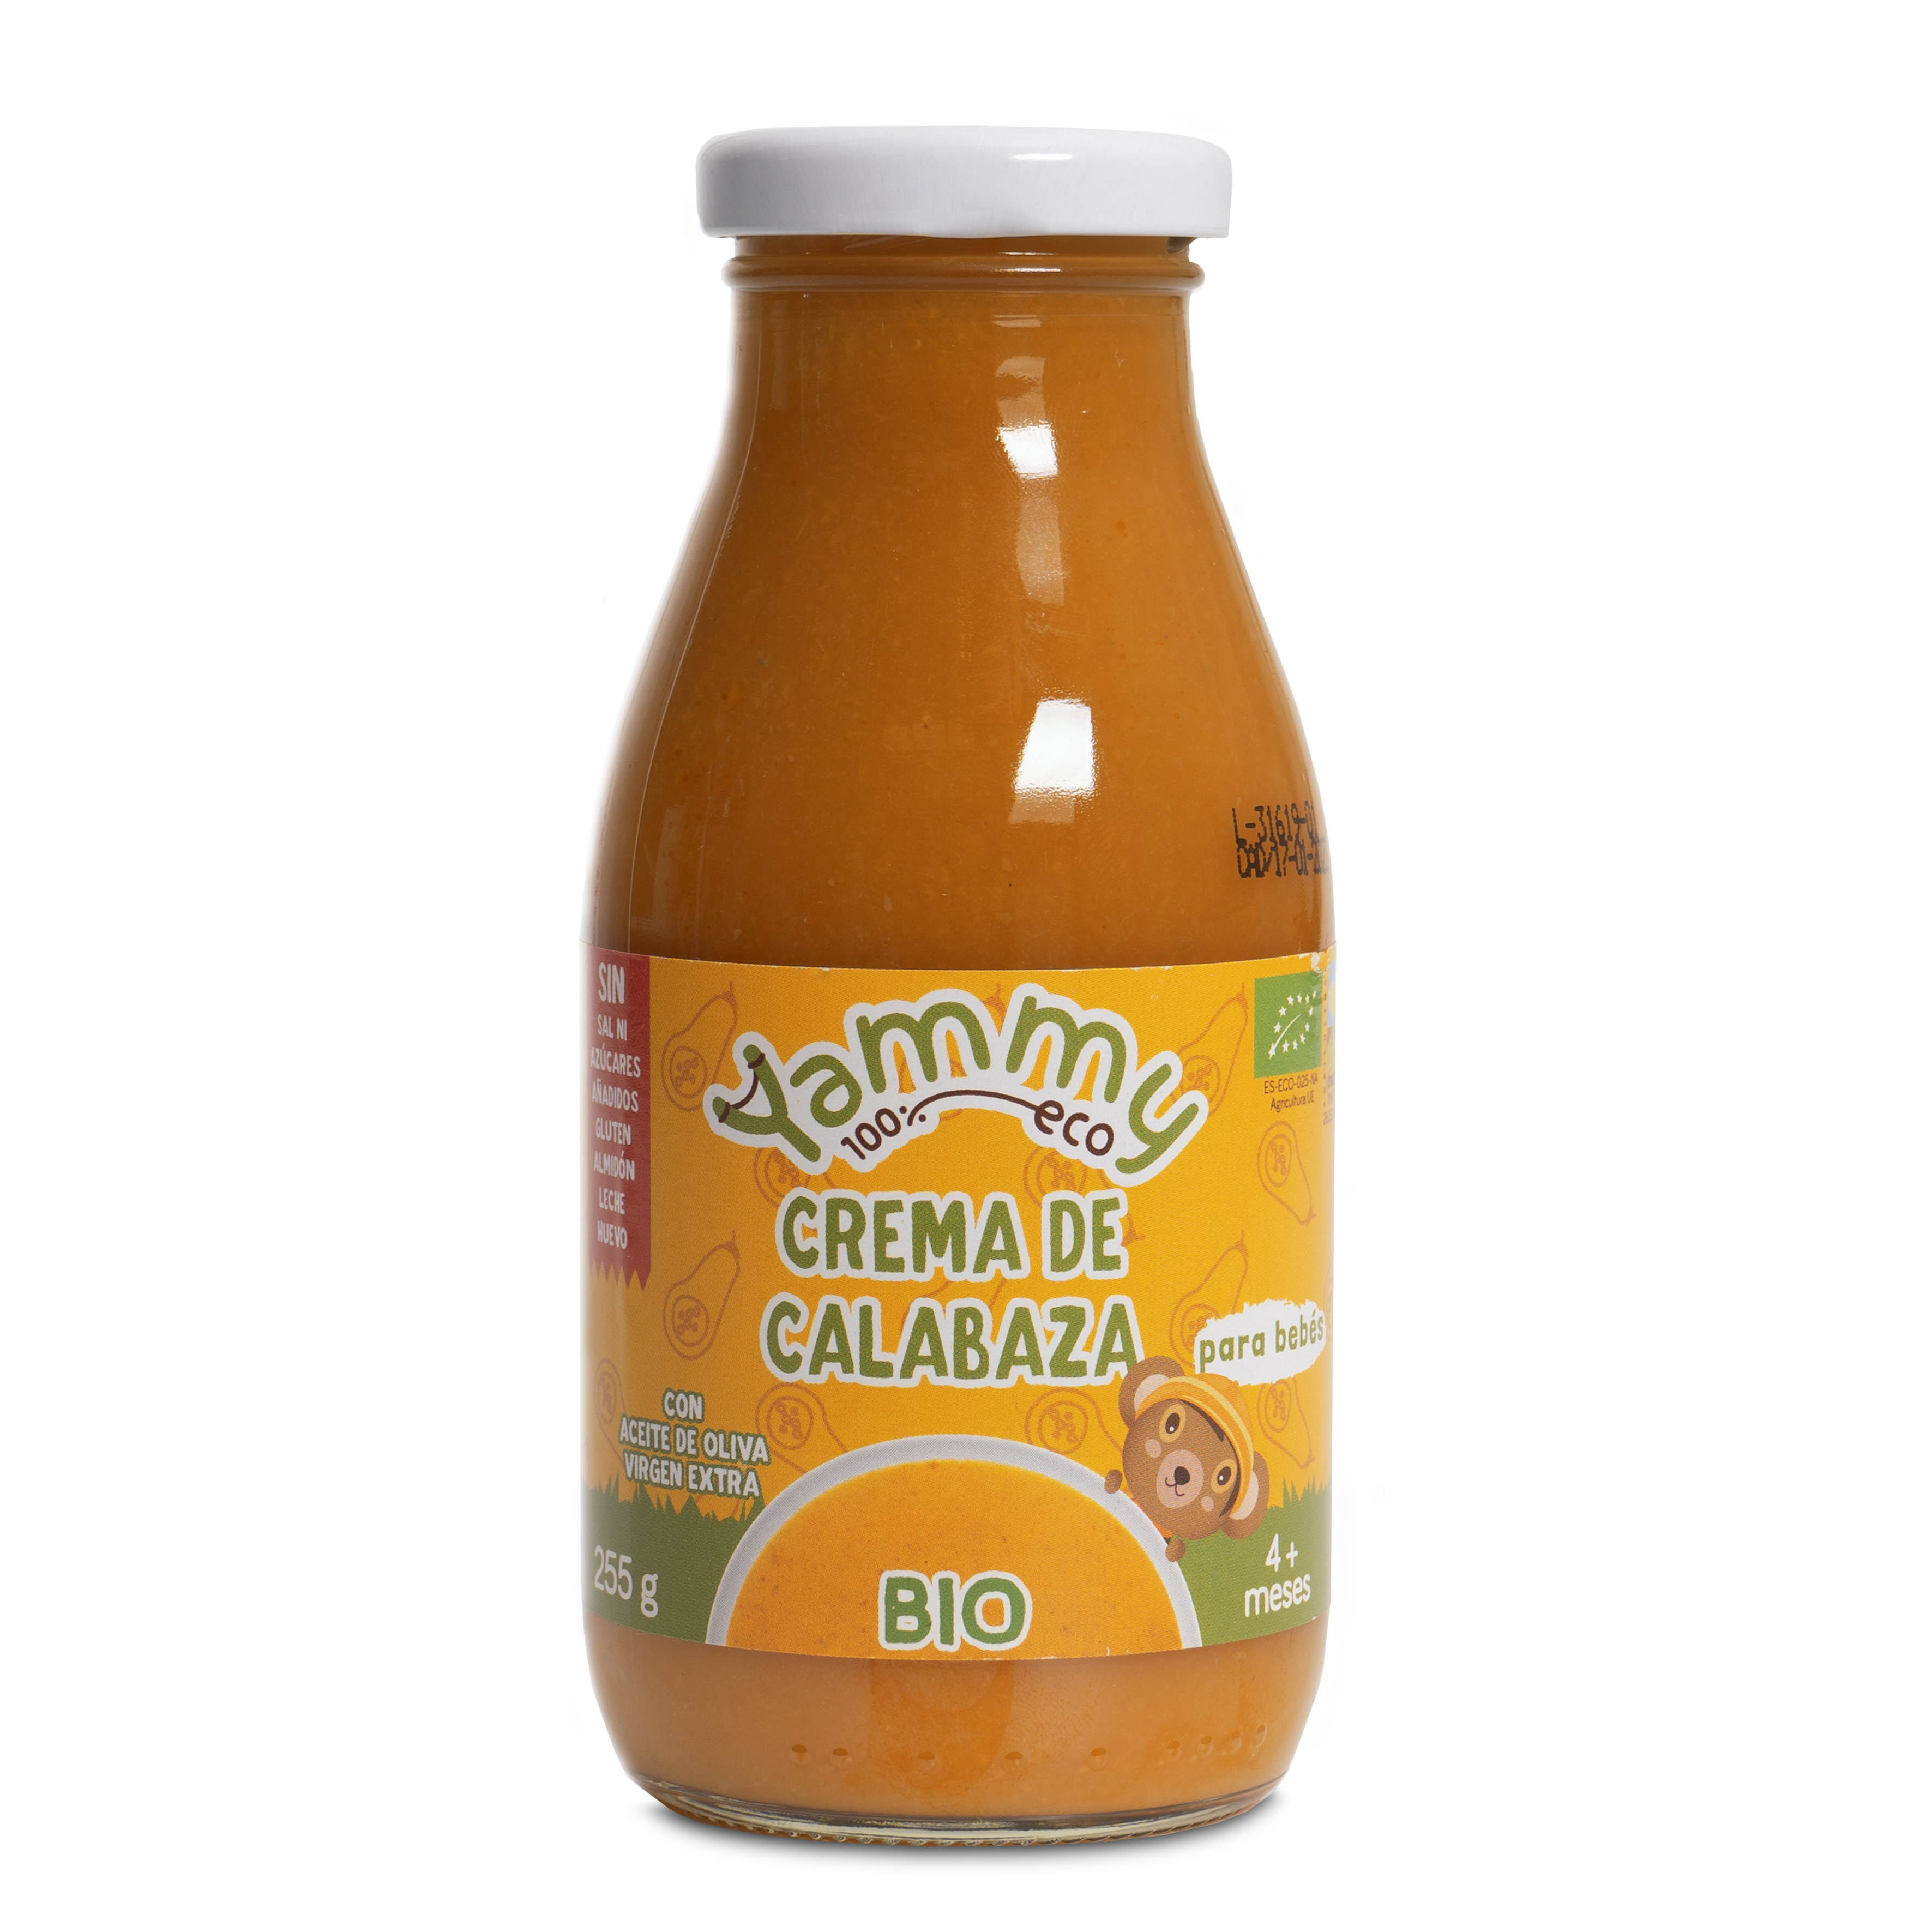 Crema Calabaza 100% ECO Yammy